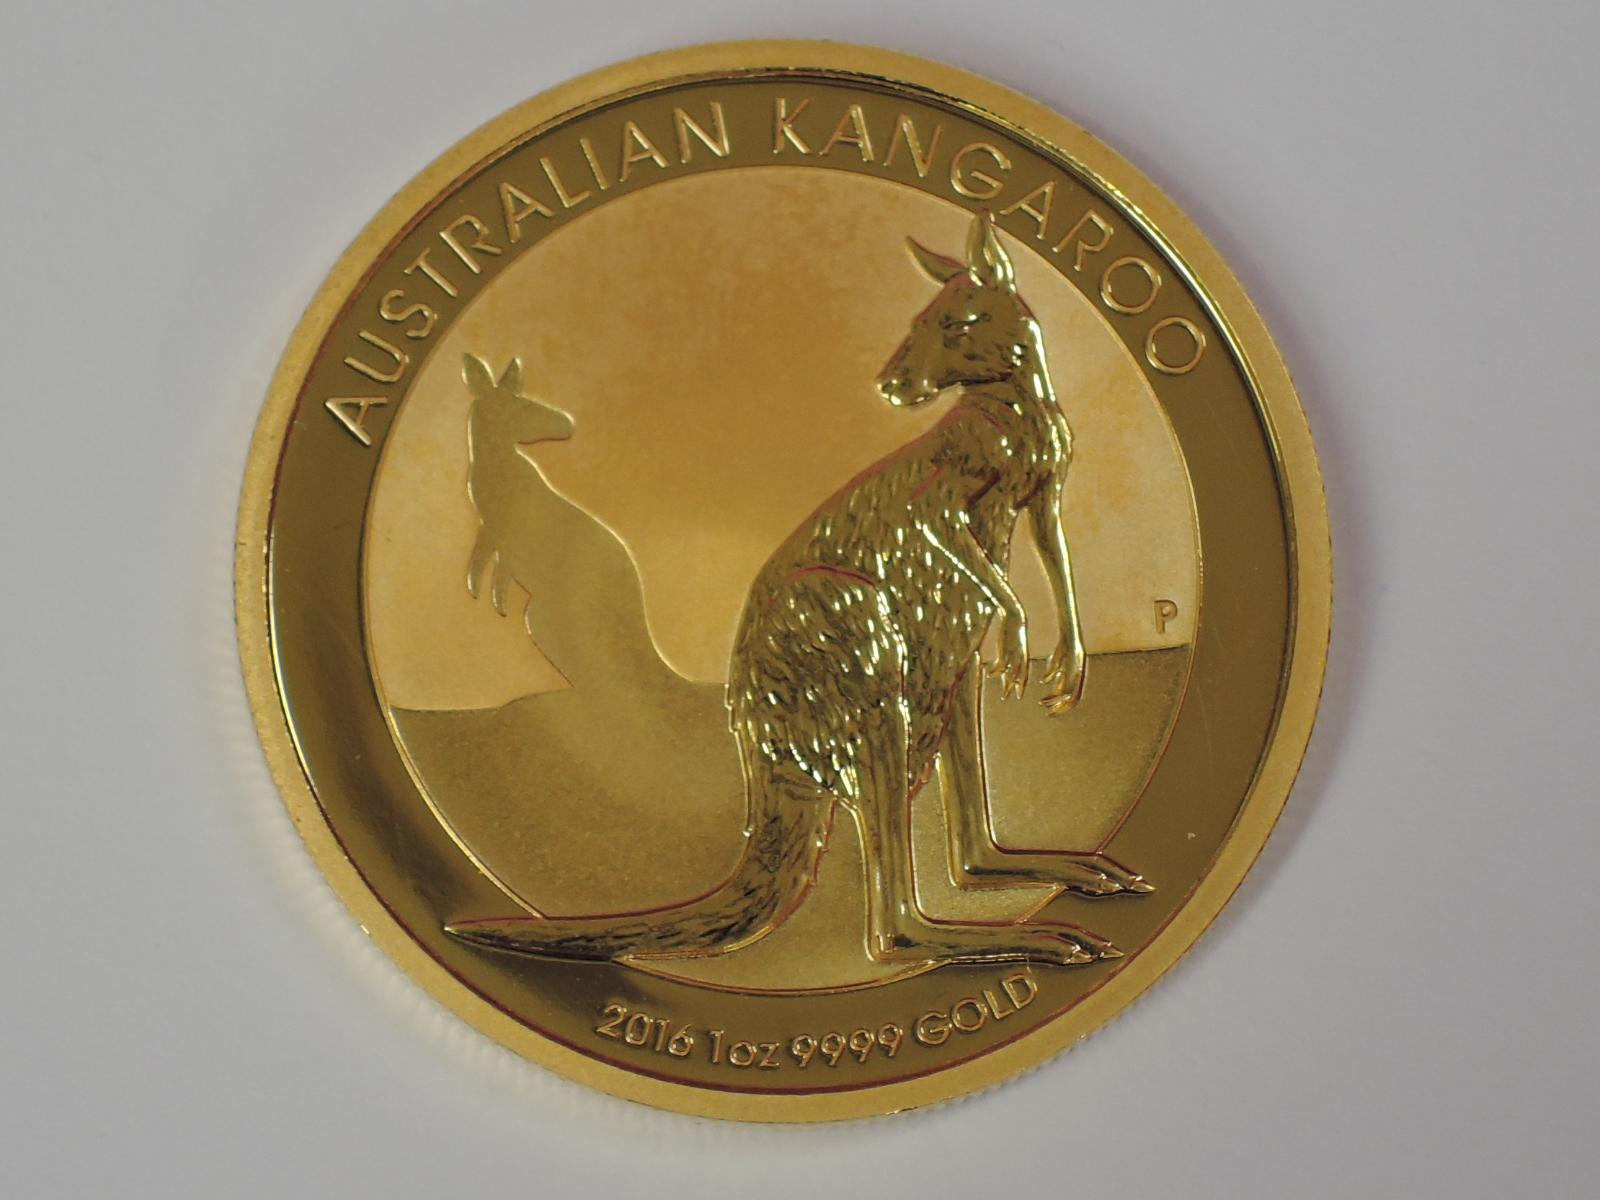 Lot 609 - A gold 1oz 2016 100 dollar Australian Kangaroo coin, in plastic case